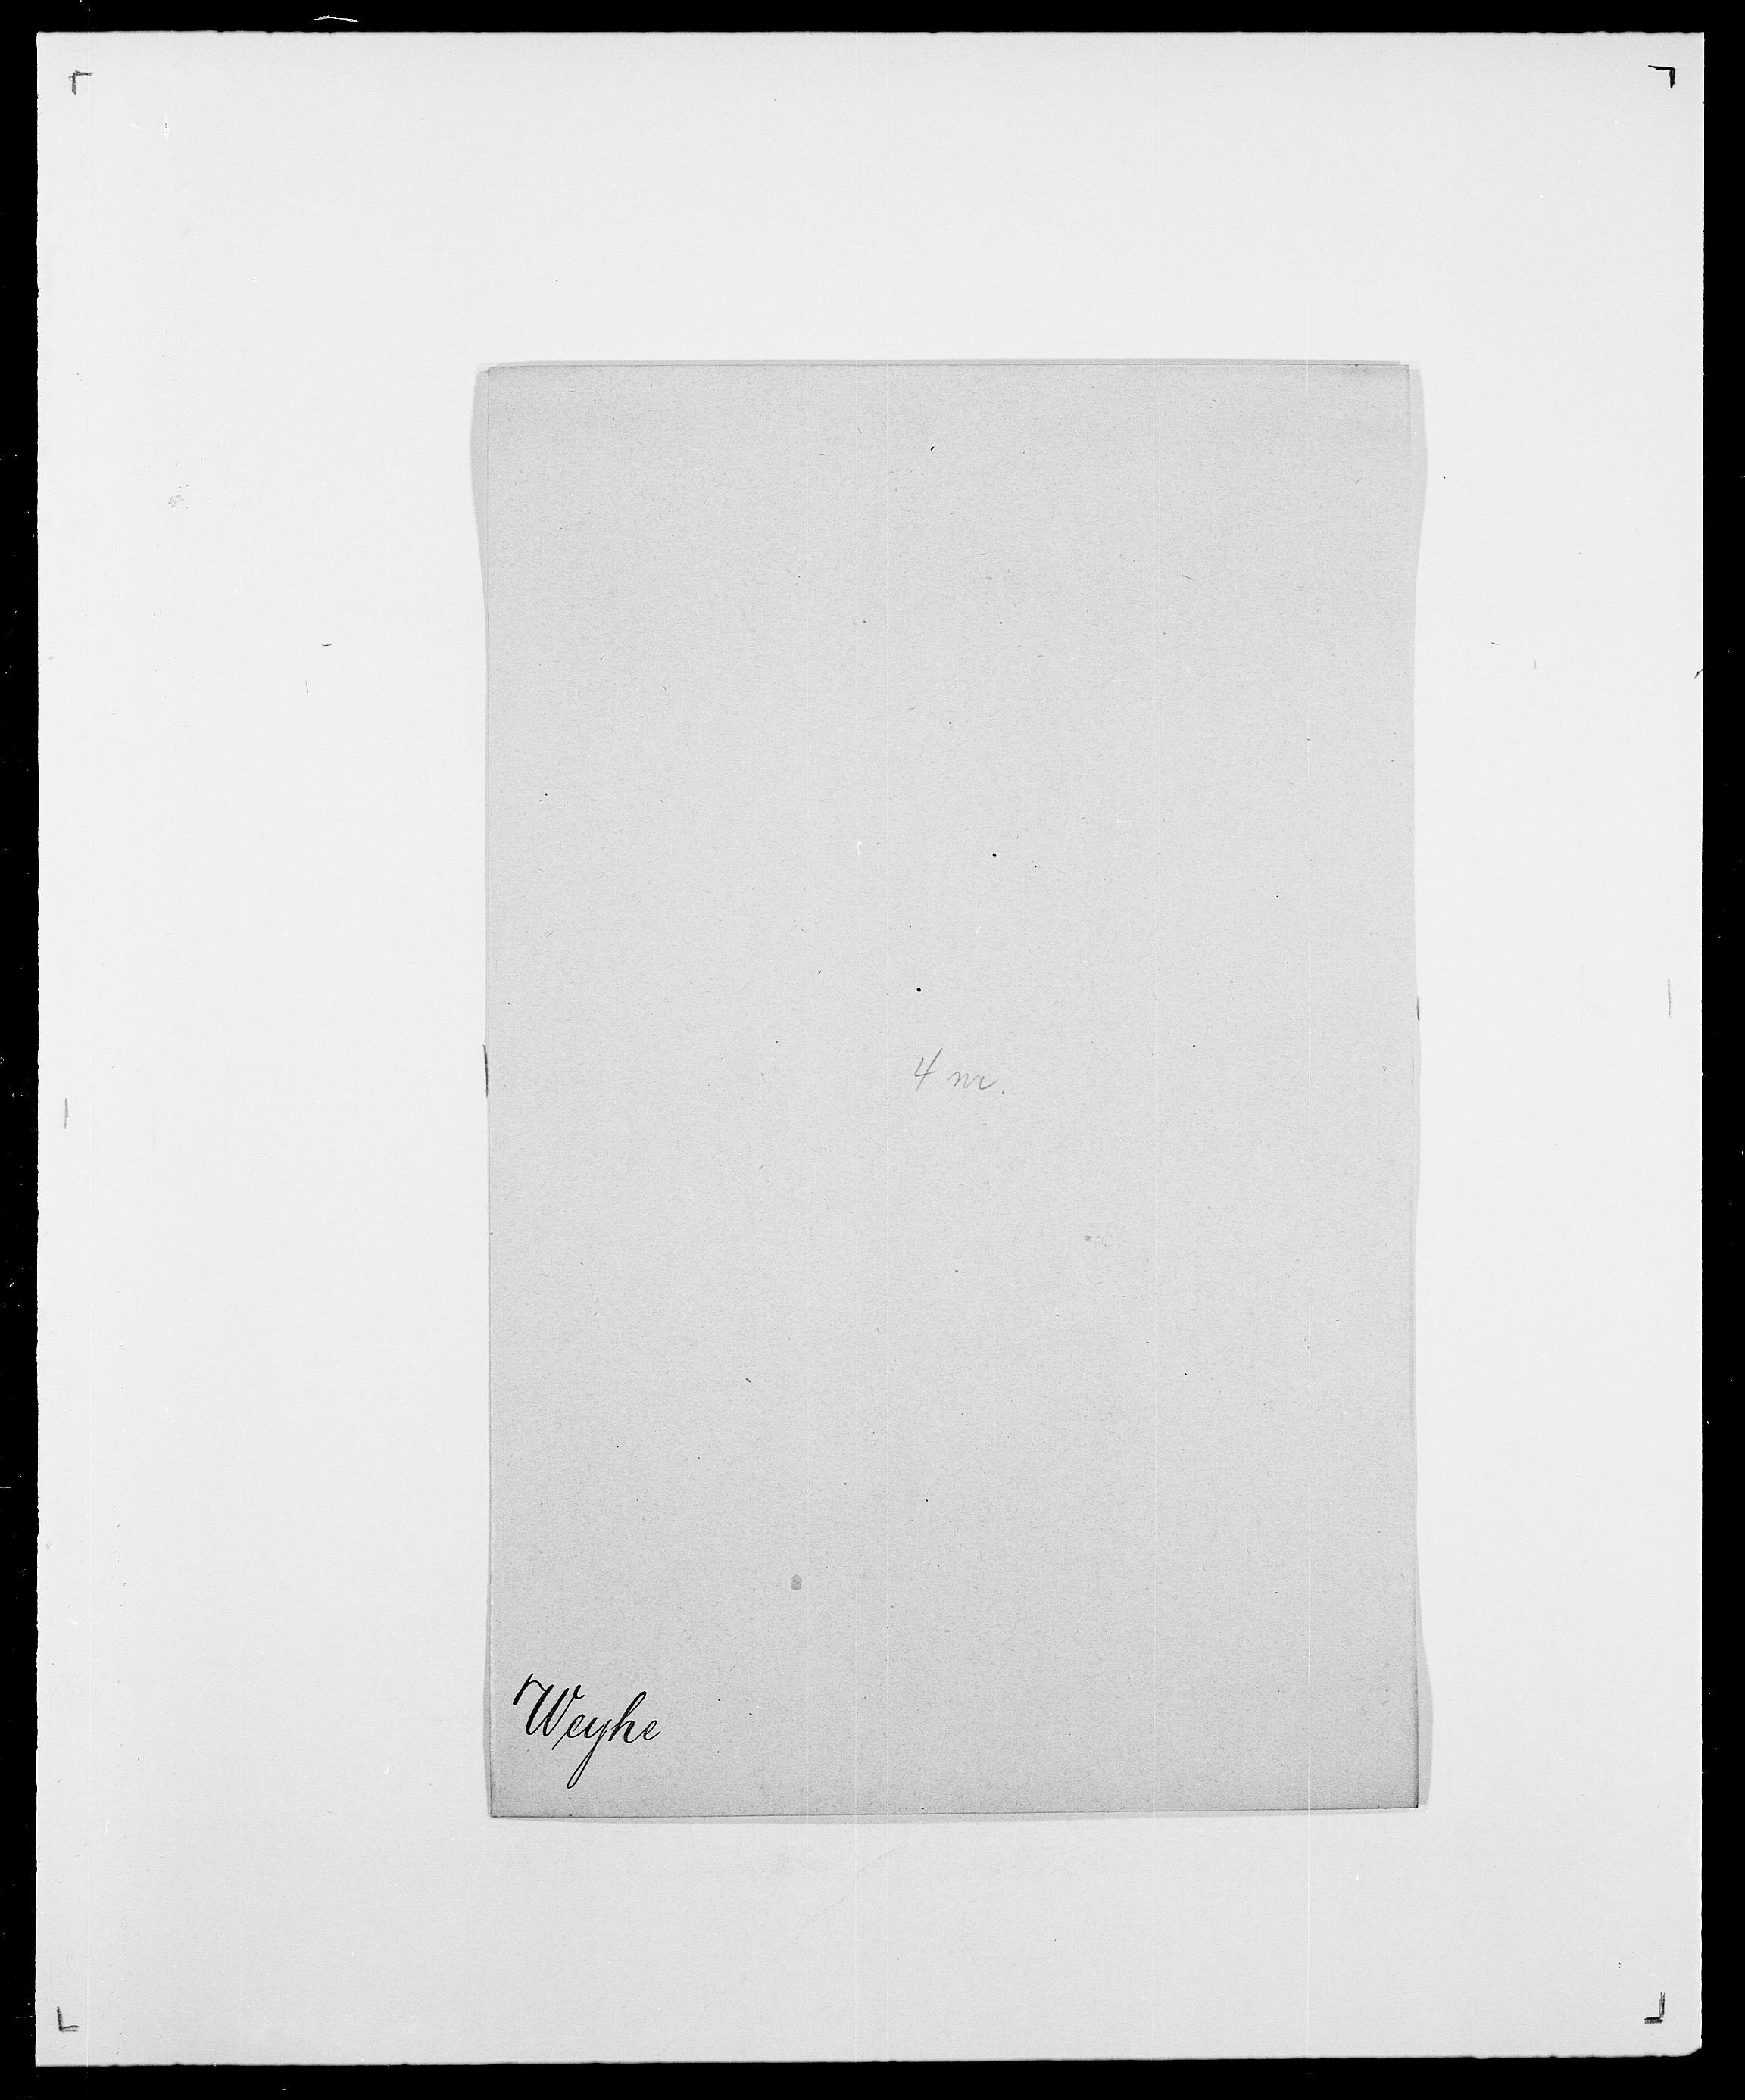 SAO, Delgobe, Charles Antoine - samling, D/Da/L0041: Vemmestad - Viker, s. 368